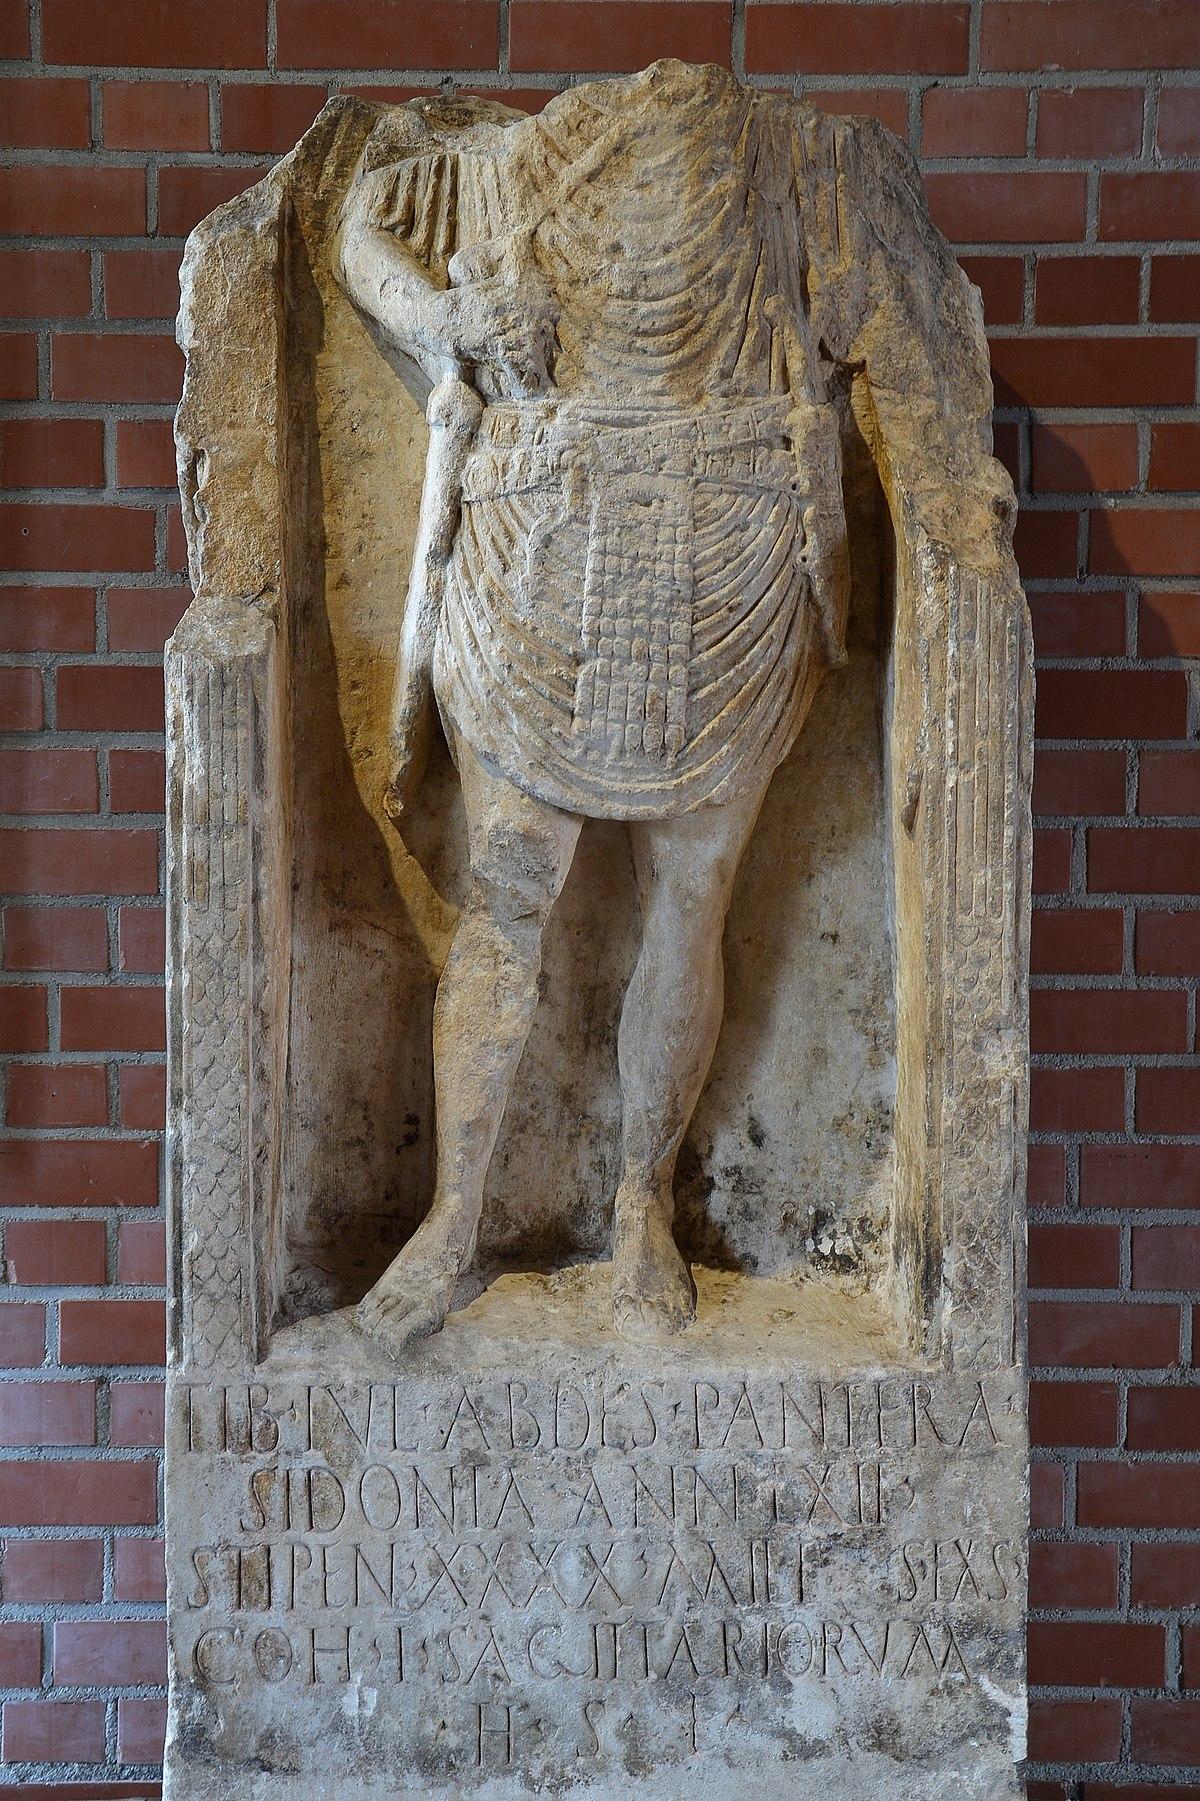 Tiberius Julius Abdes Pantera - Wikipedia